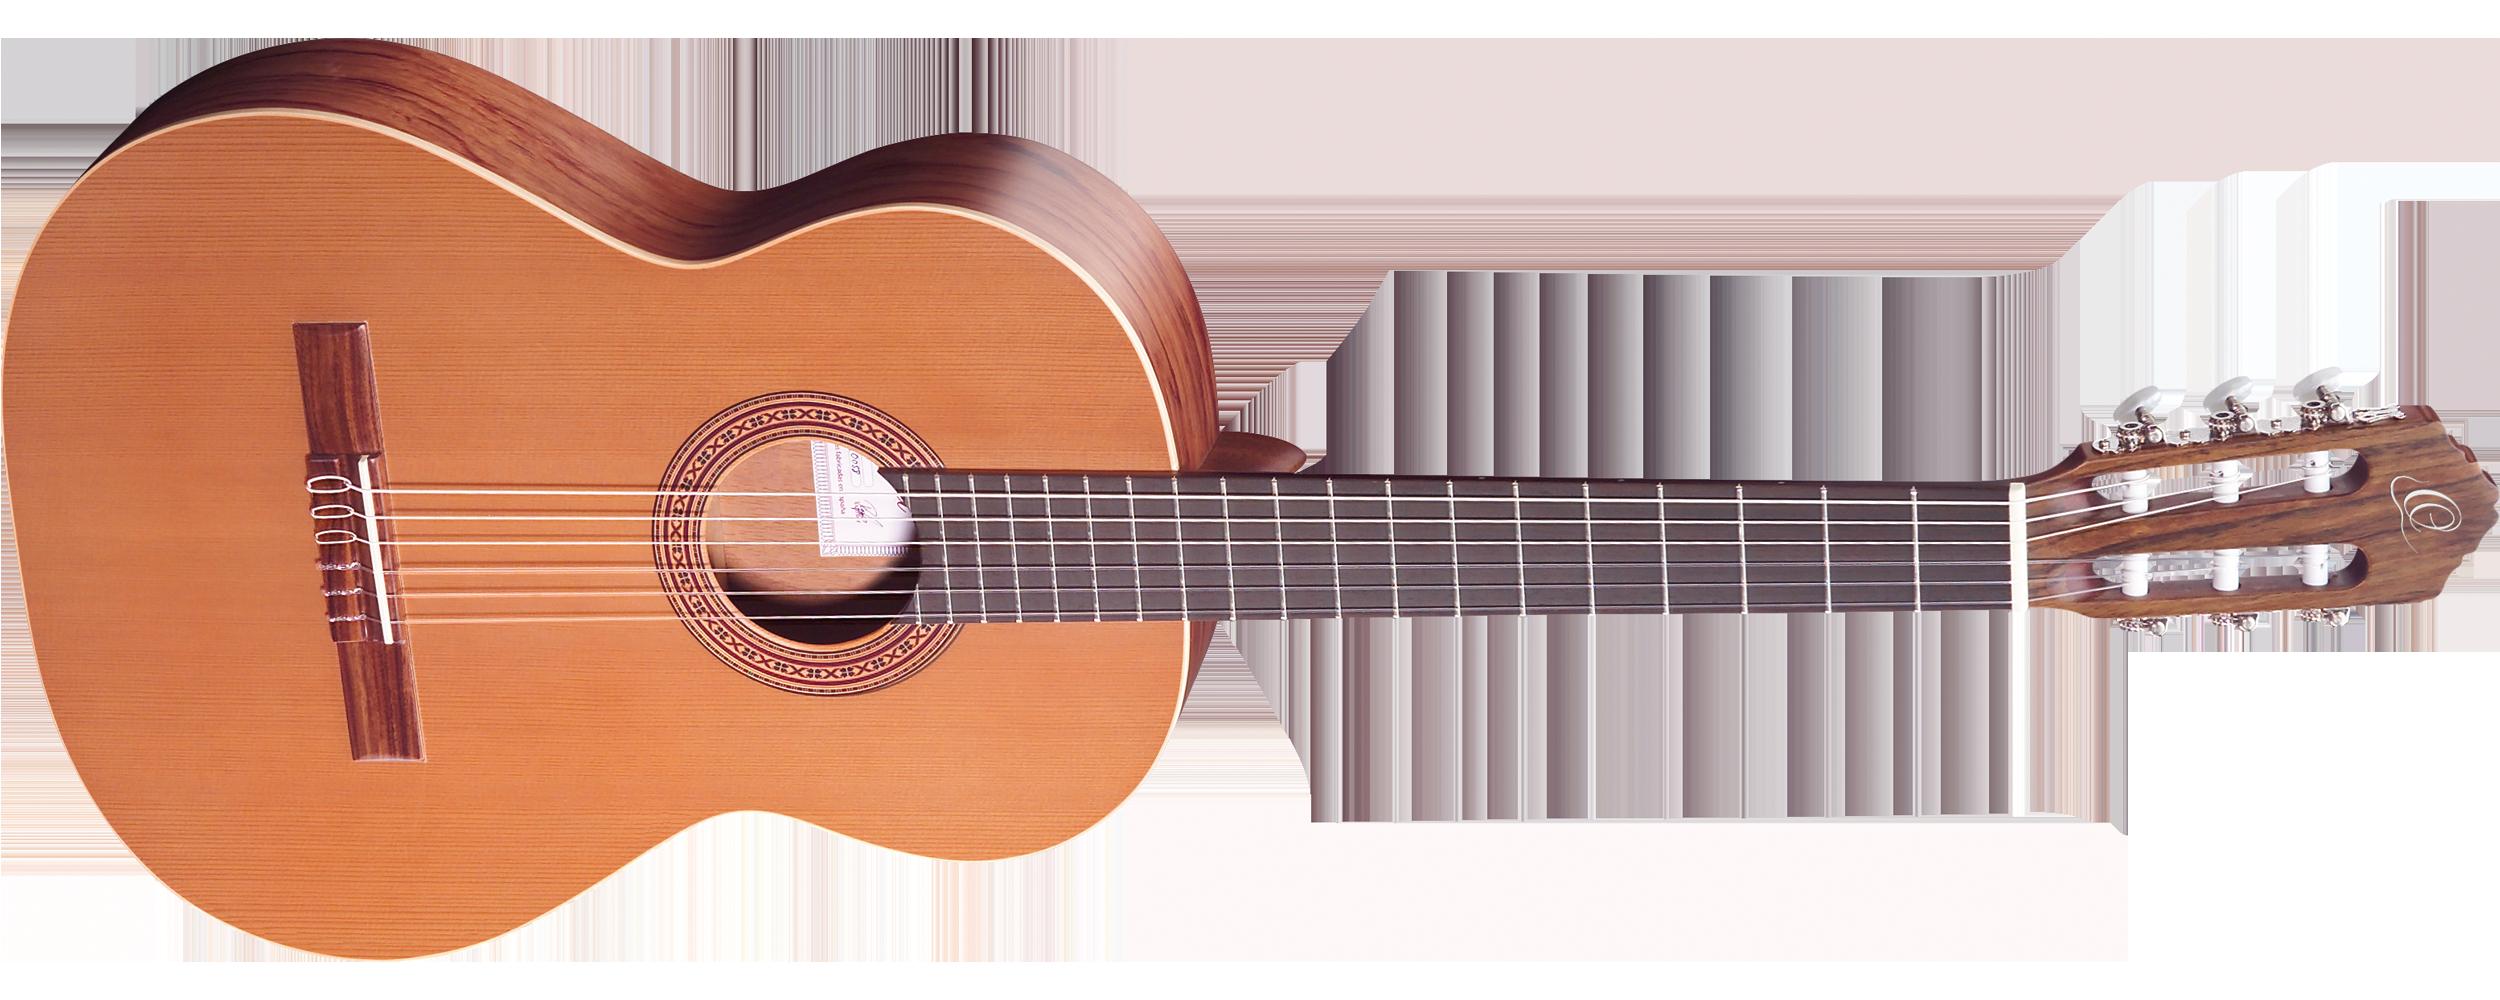 jpg freeuse download Acoustic clipart guitar spain. Ortega your r